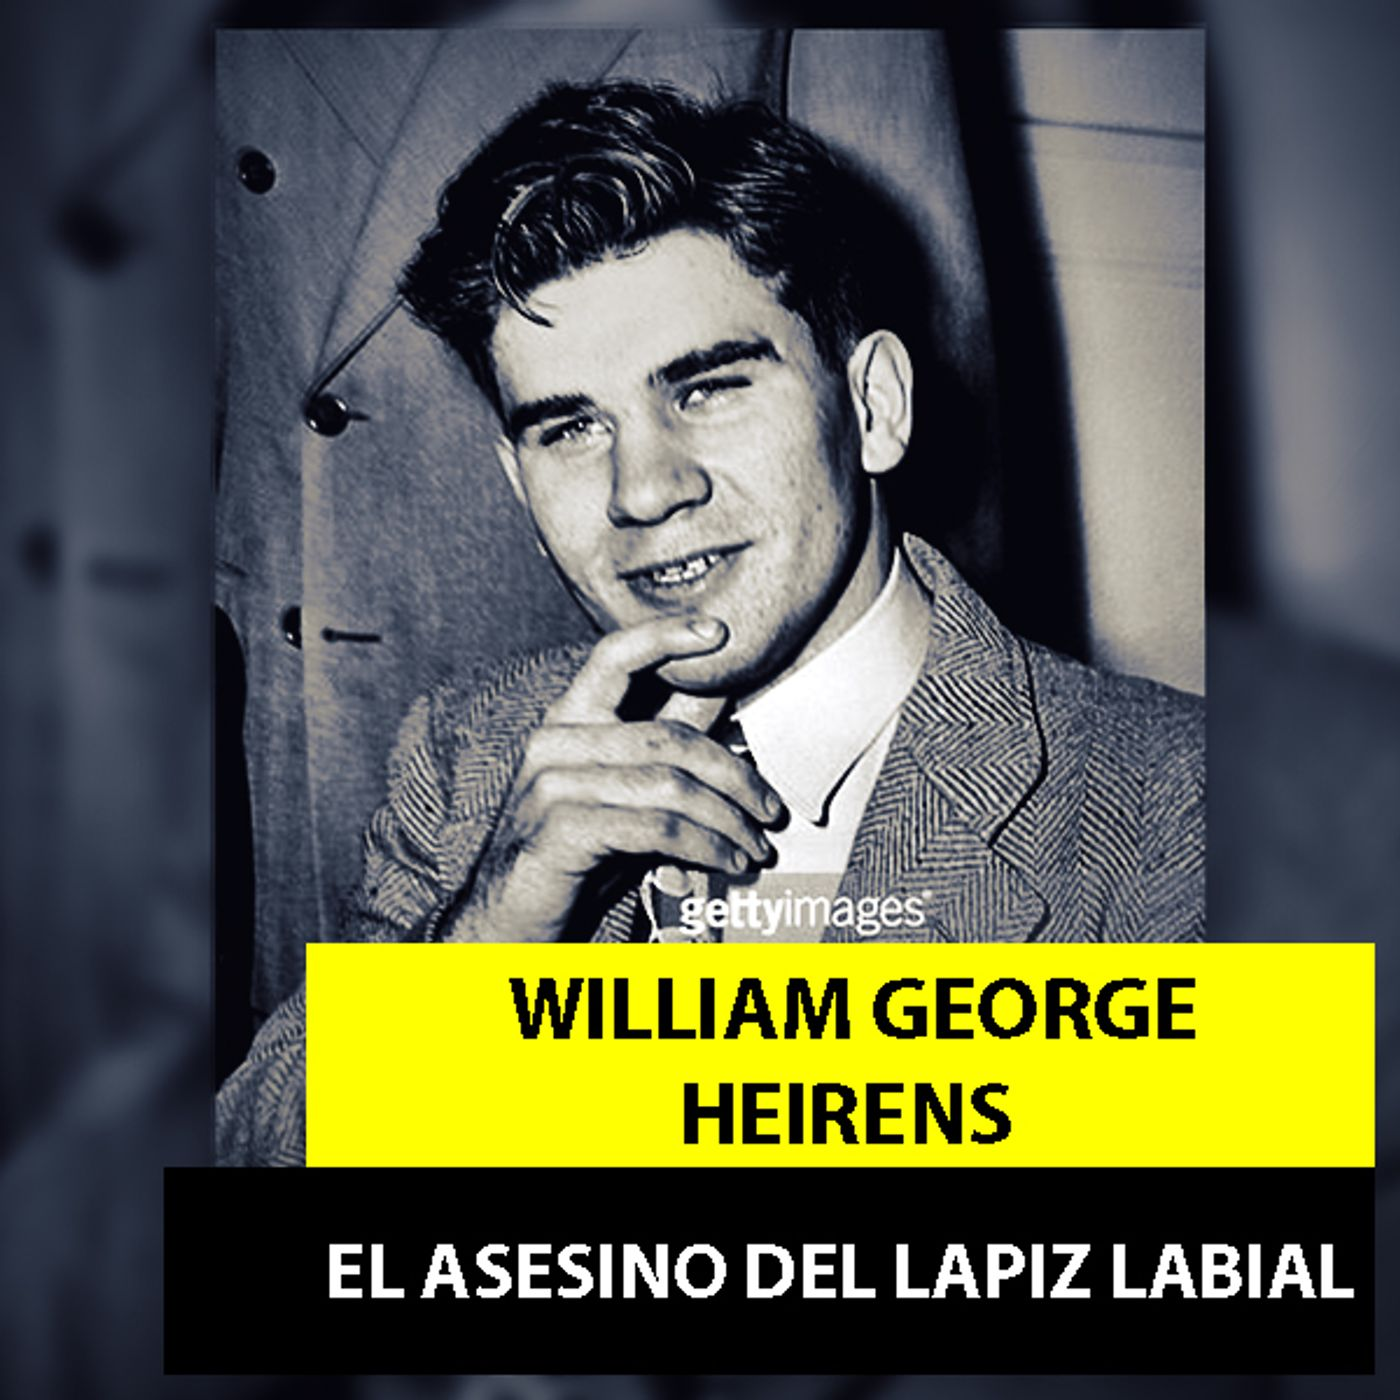 William George Heirens | El Asesino Del Lápiz Labial